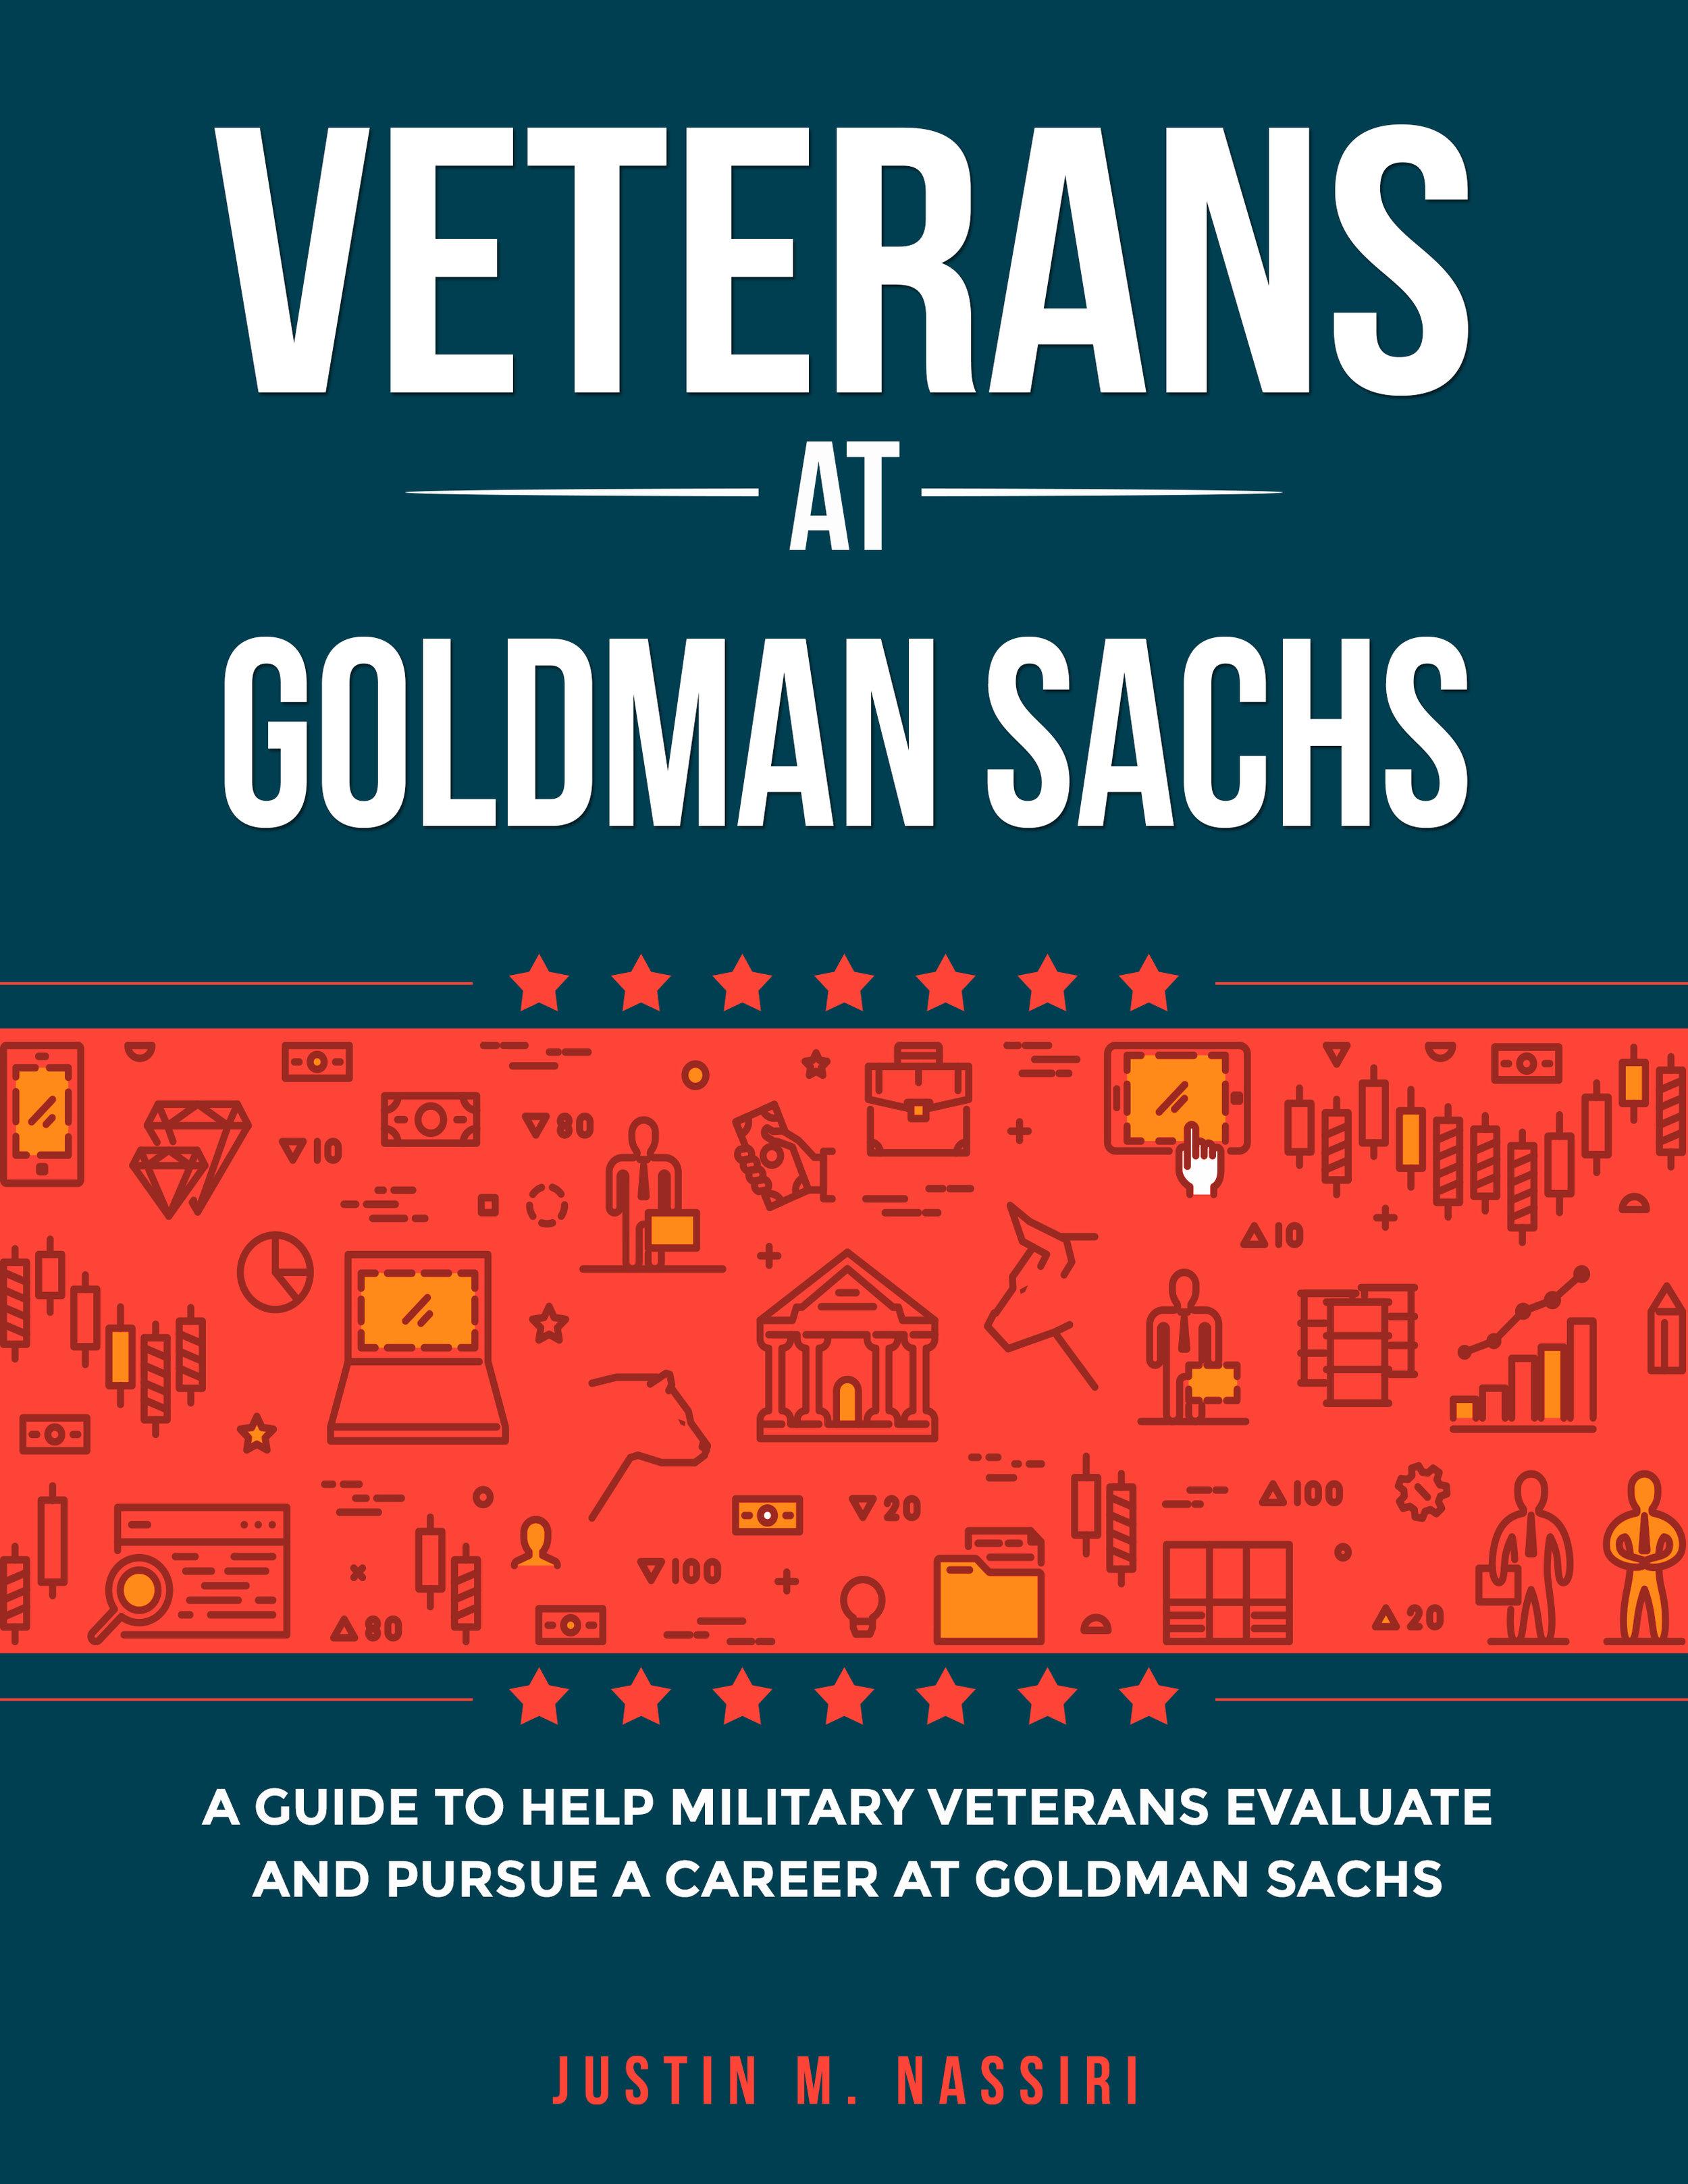 Veterans_at_Goldman_Sachs.jpg